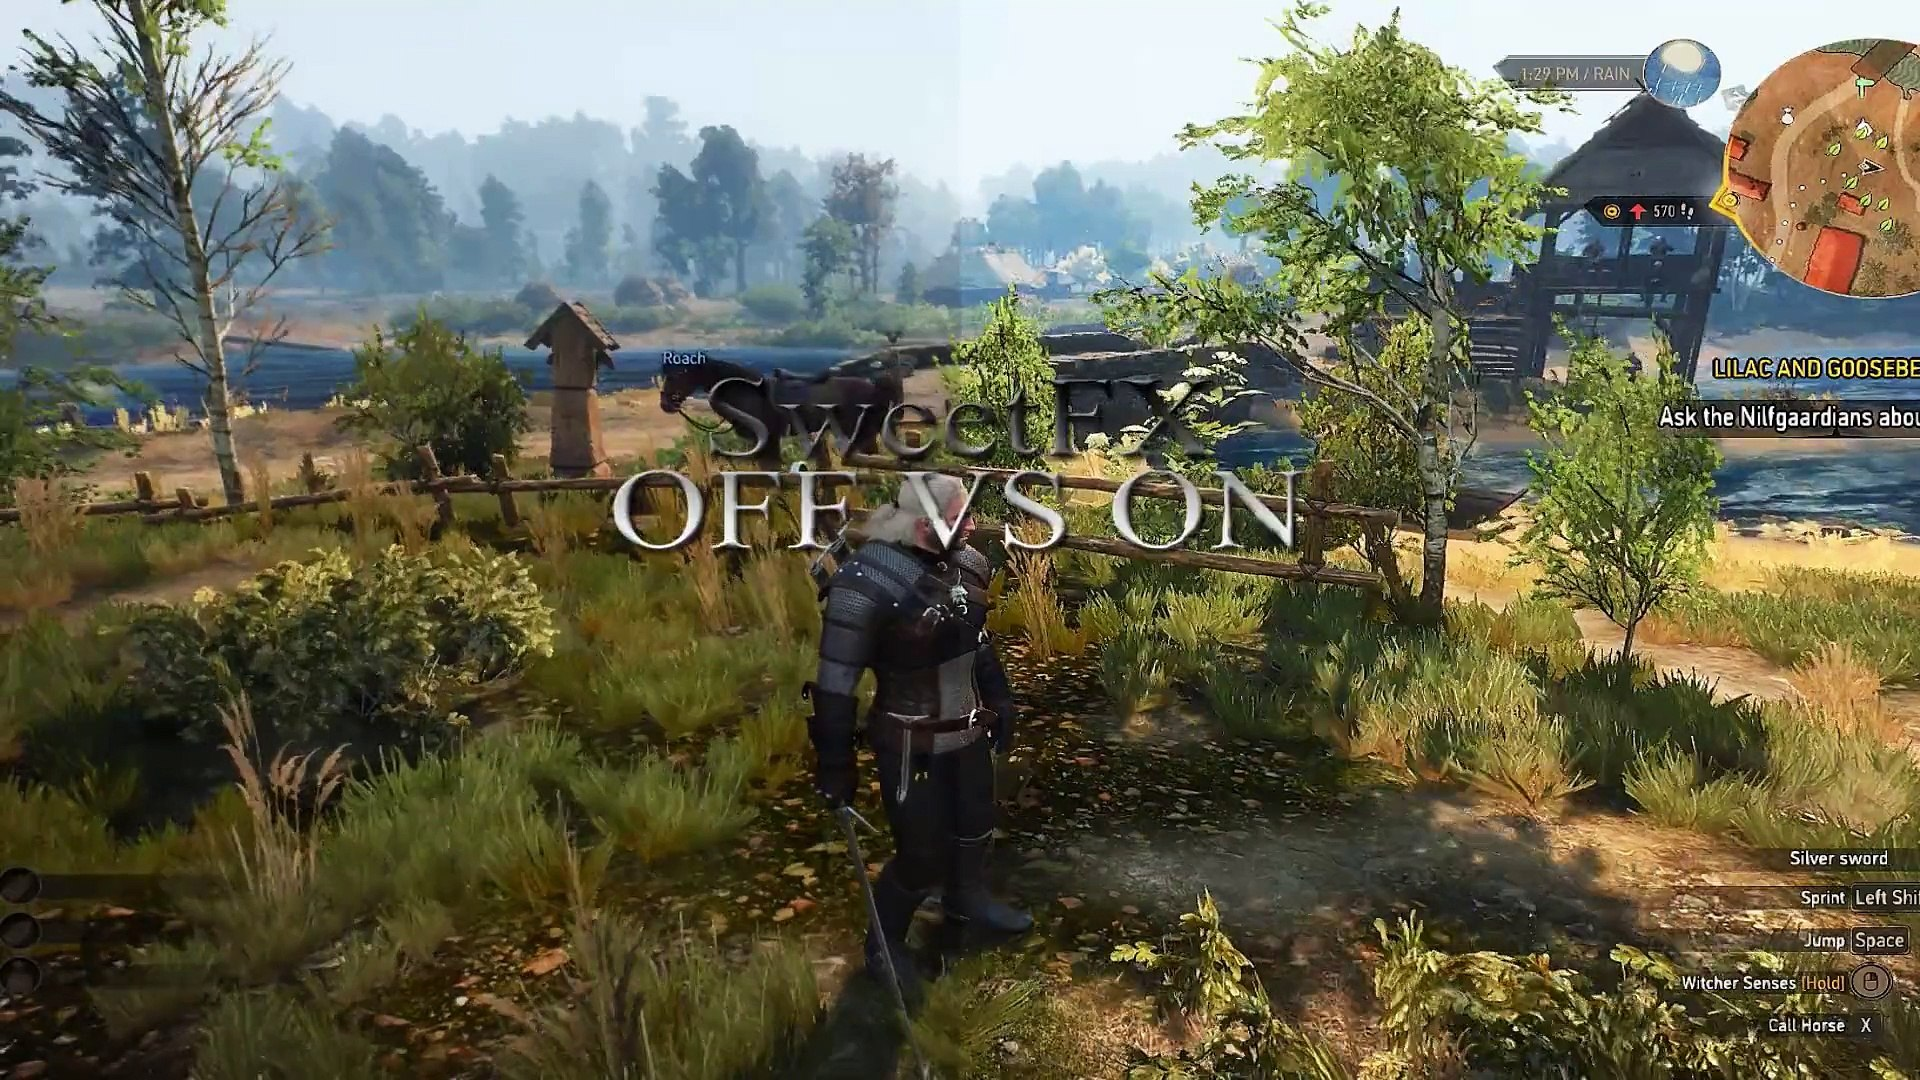 Witcher 3 – SweetFX/ReShade – MTechpark [Preset V3] - PC Gameplay on R9  290X, i7 4790K